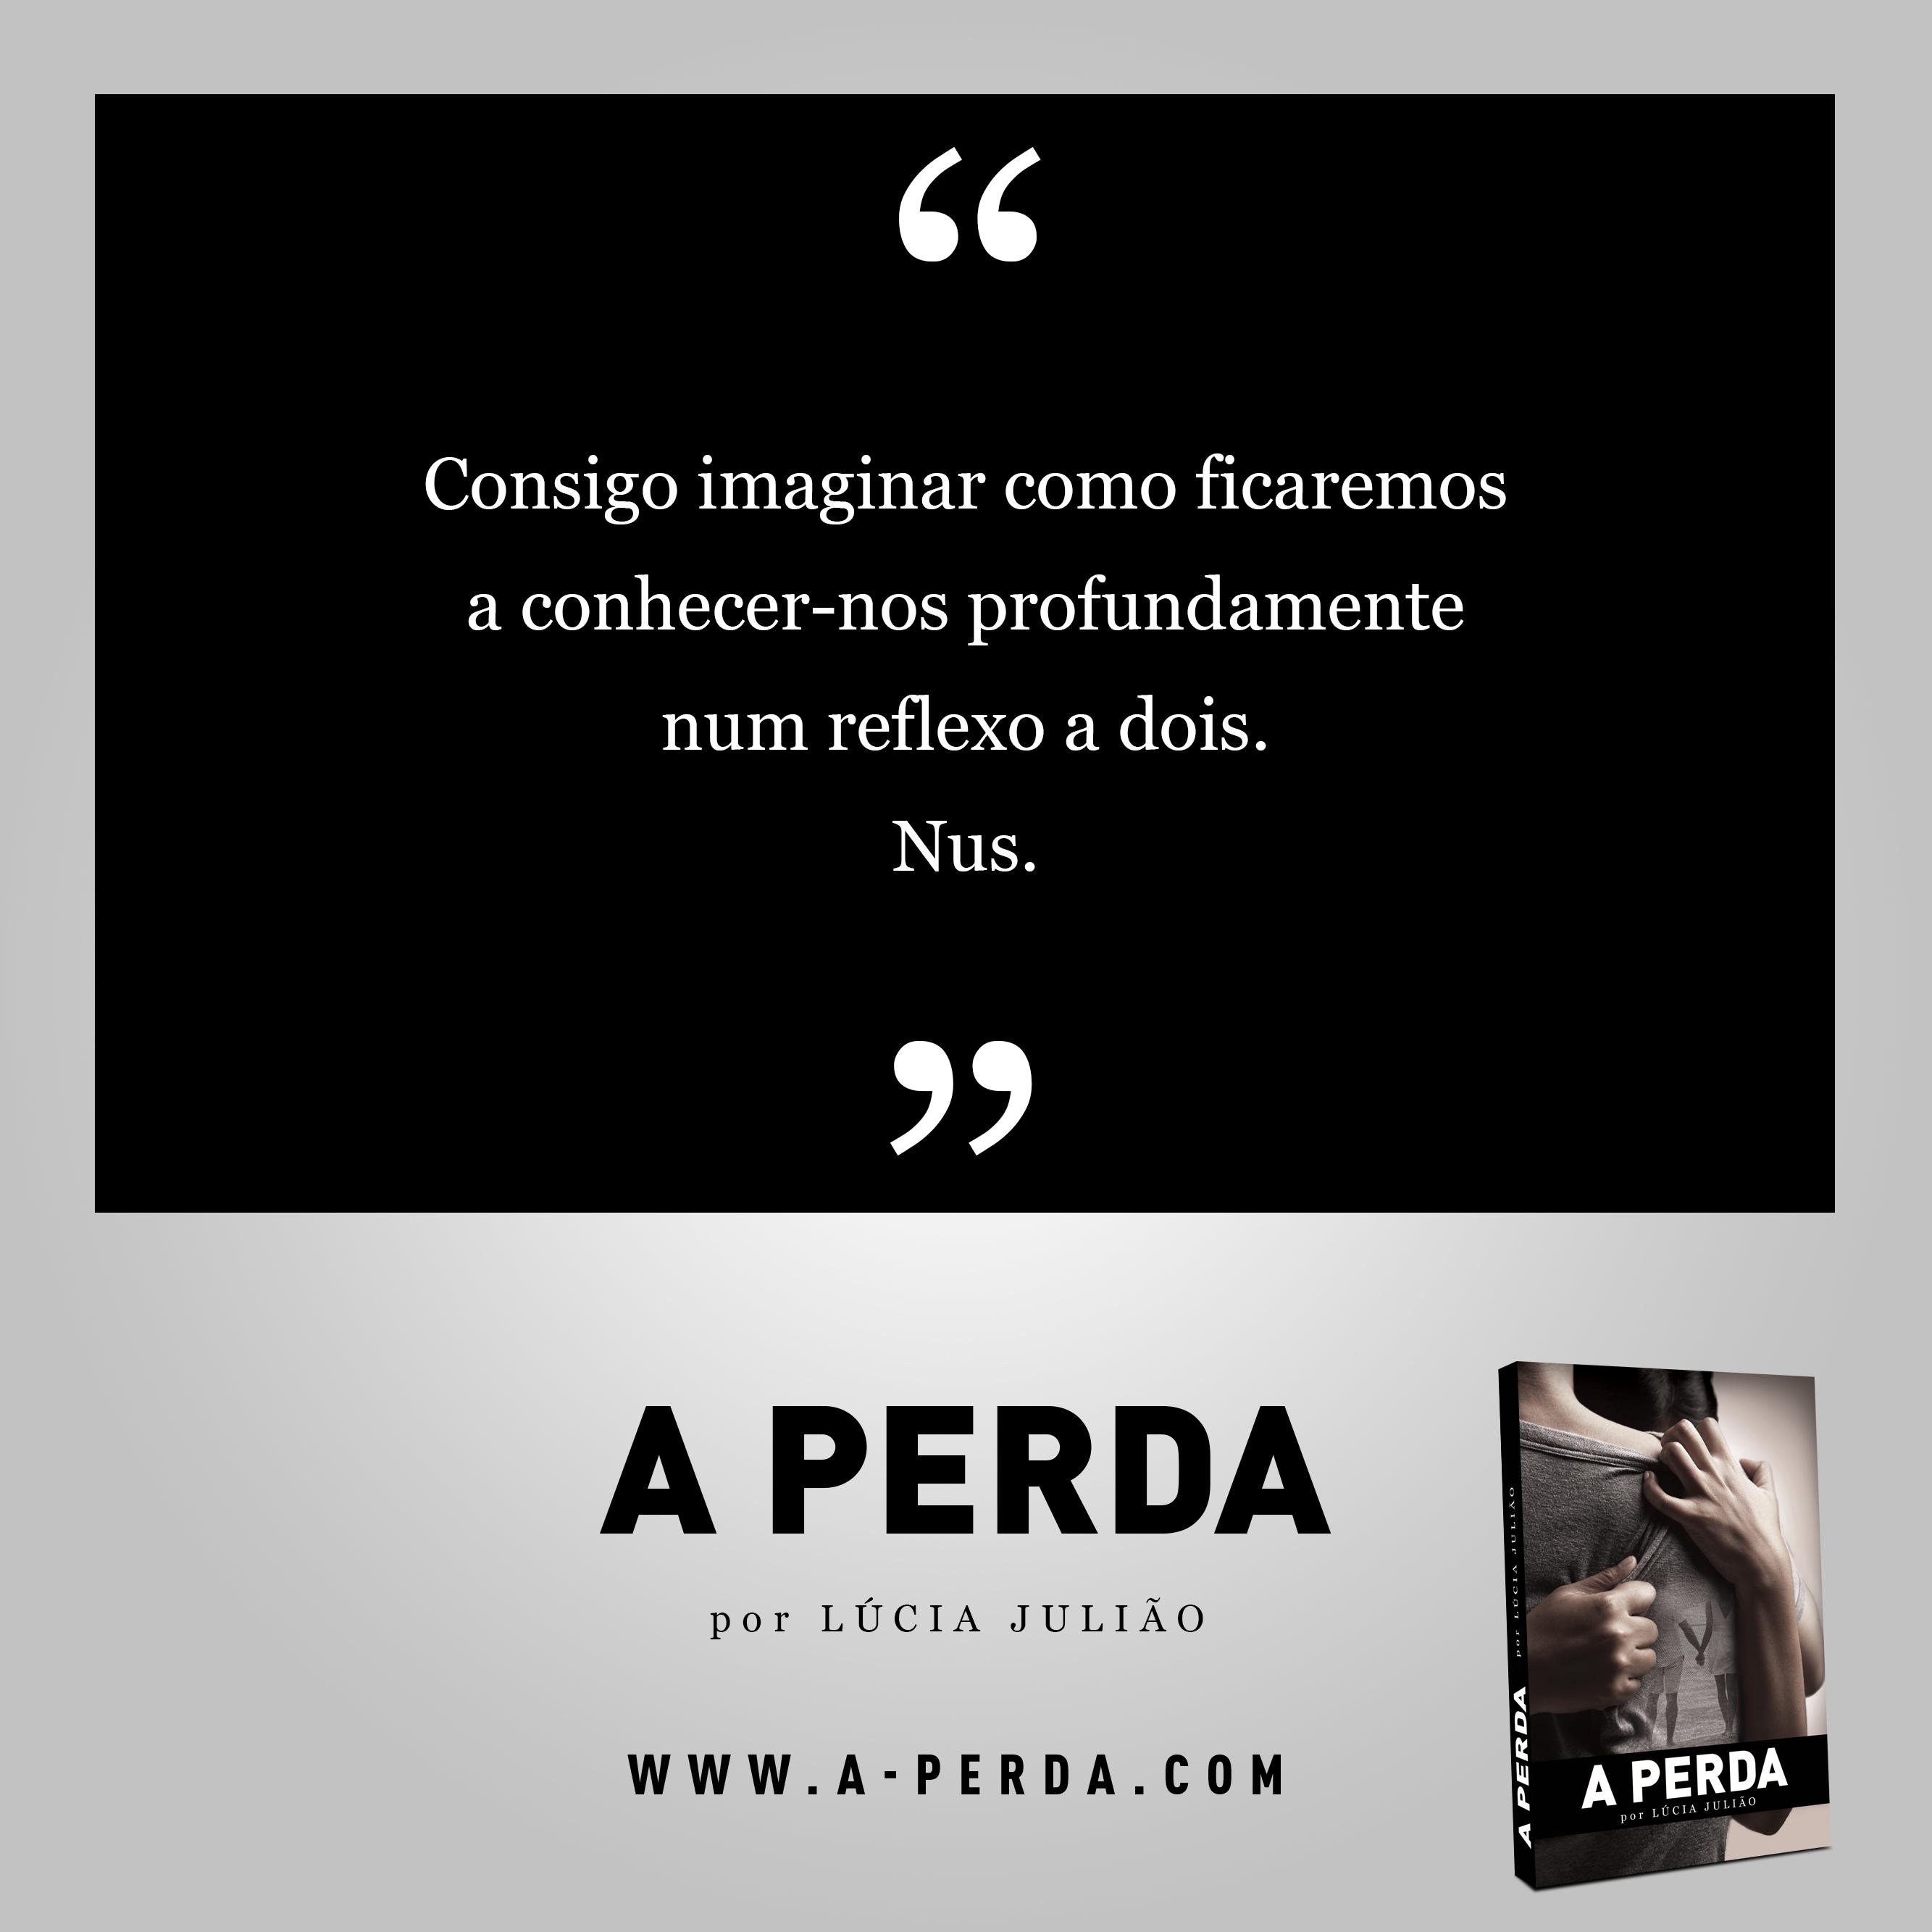 031-capitulo-10-livro-a-Perda-de-Lucia-Juliao-Instagram